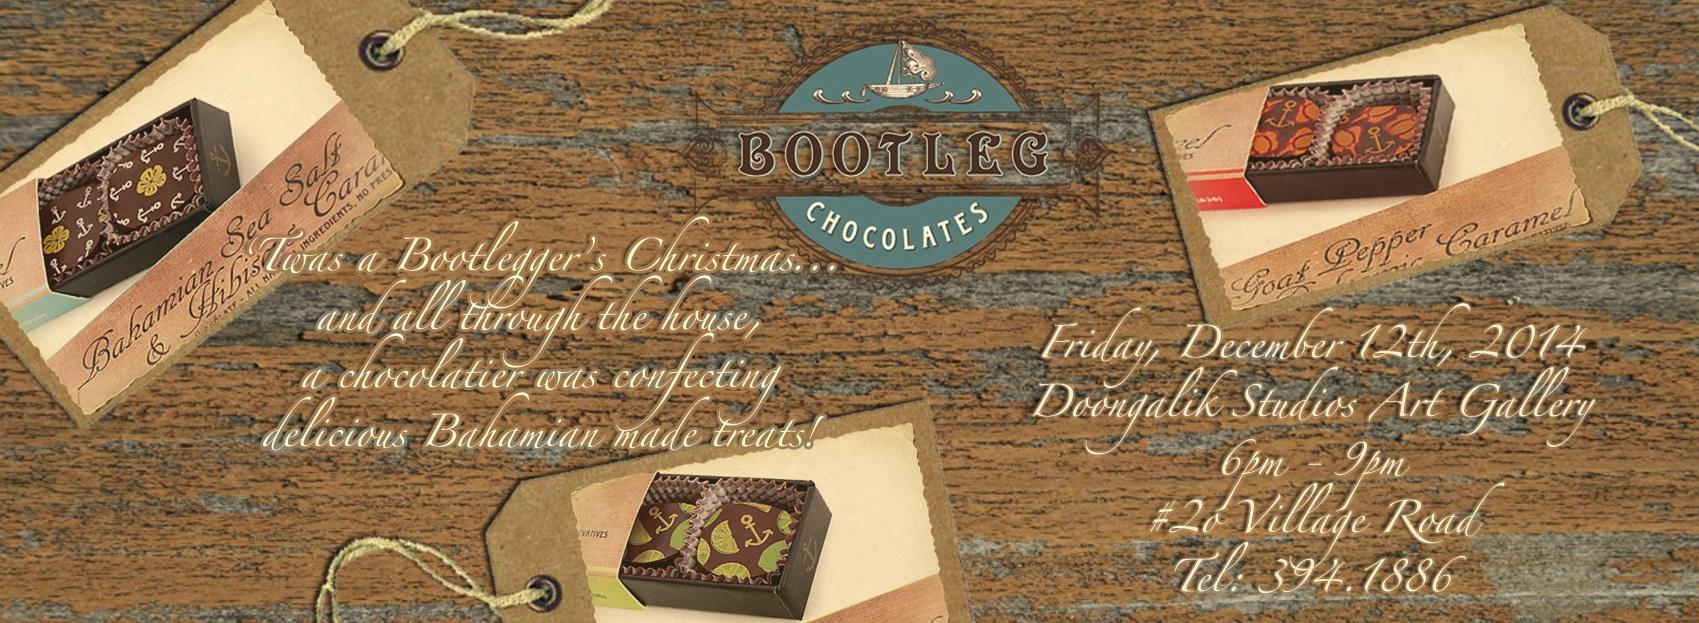 Bootleg Chocolates